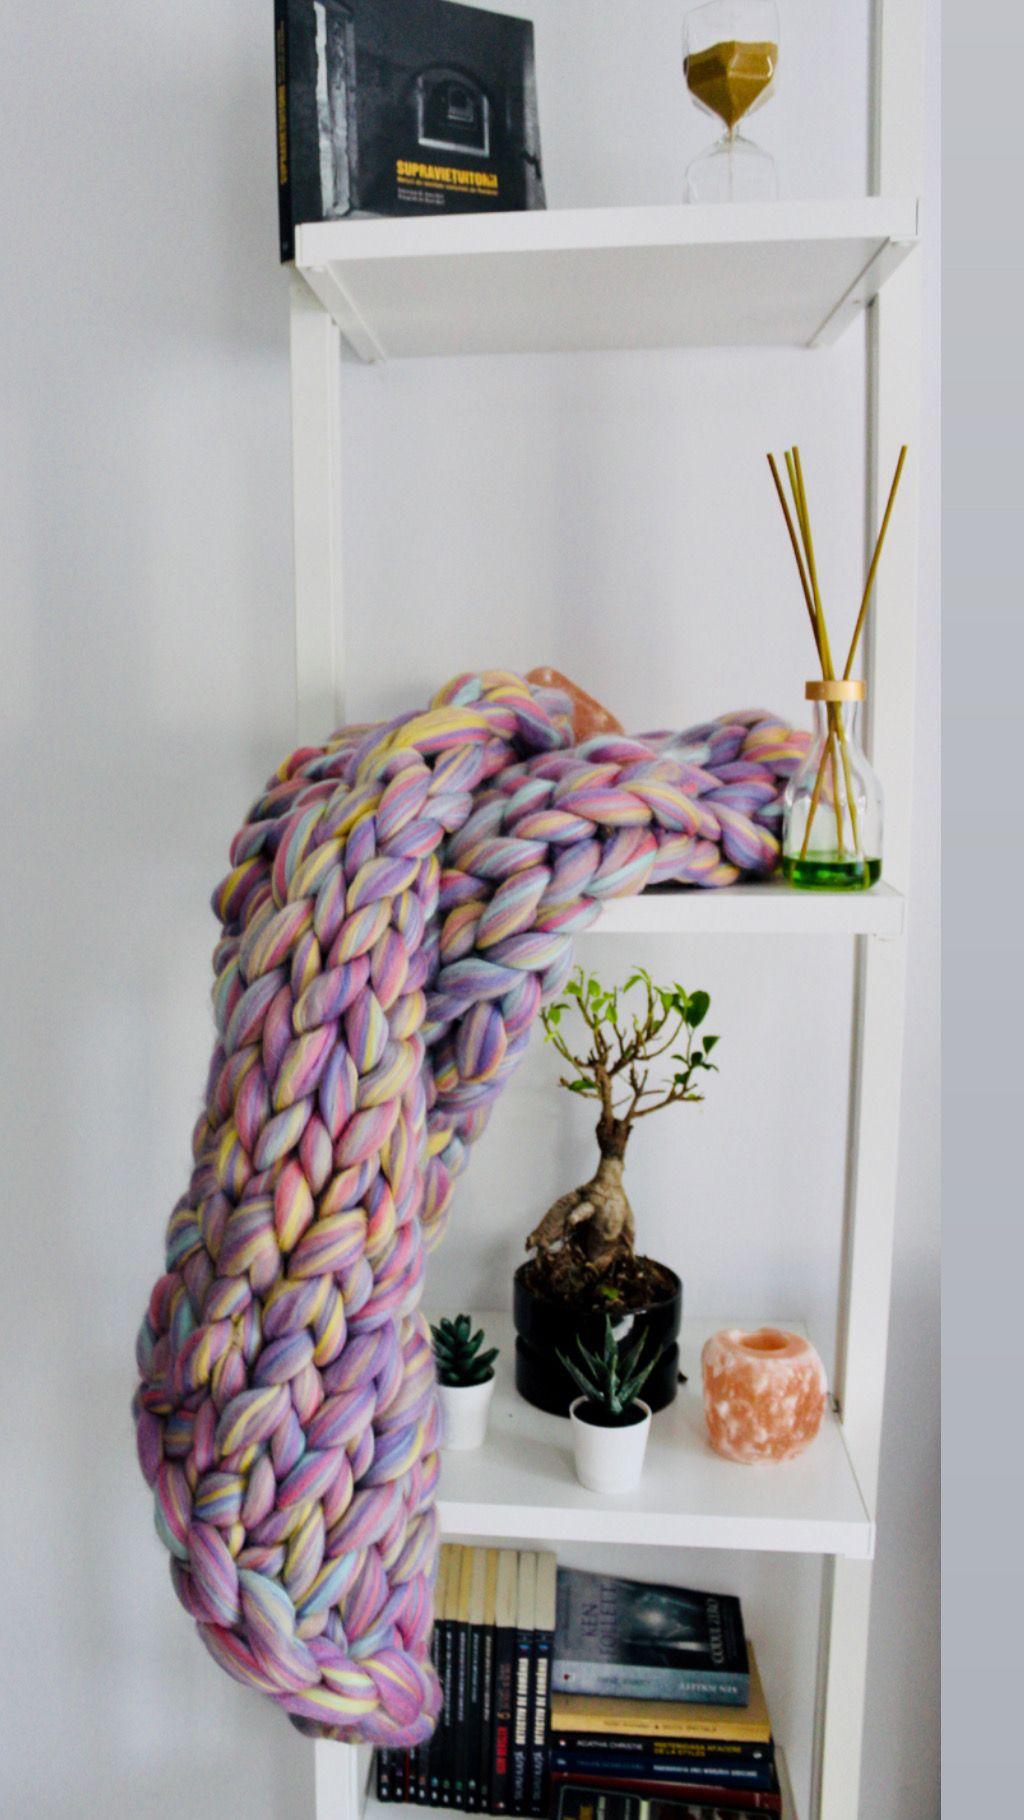 Giant blanket wool